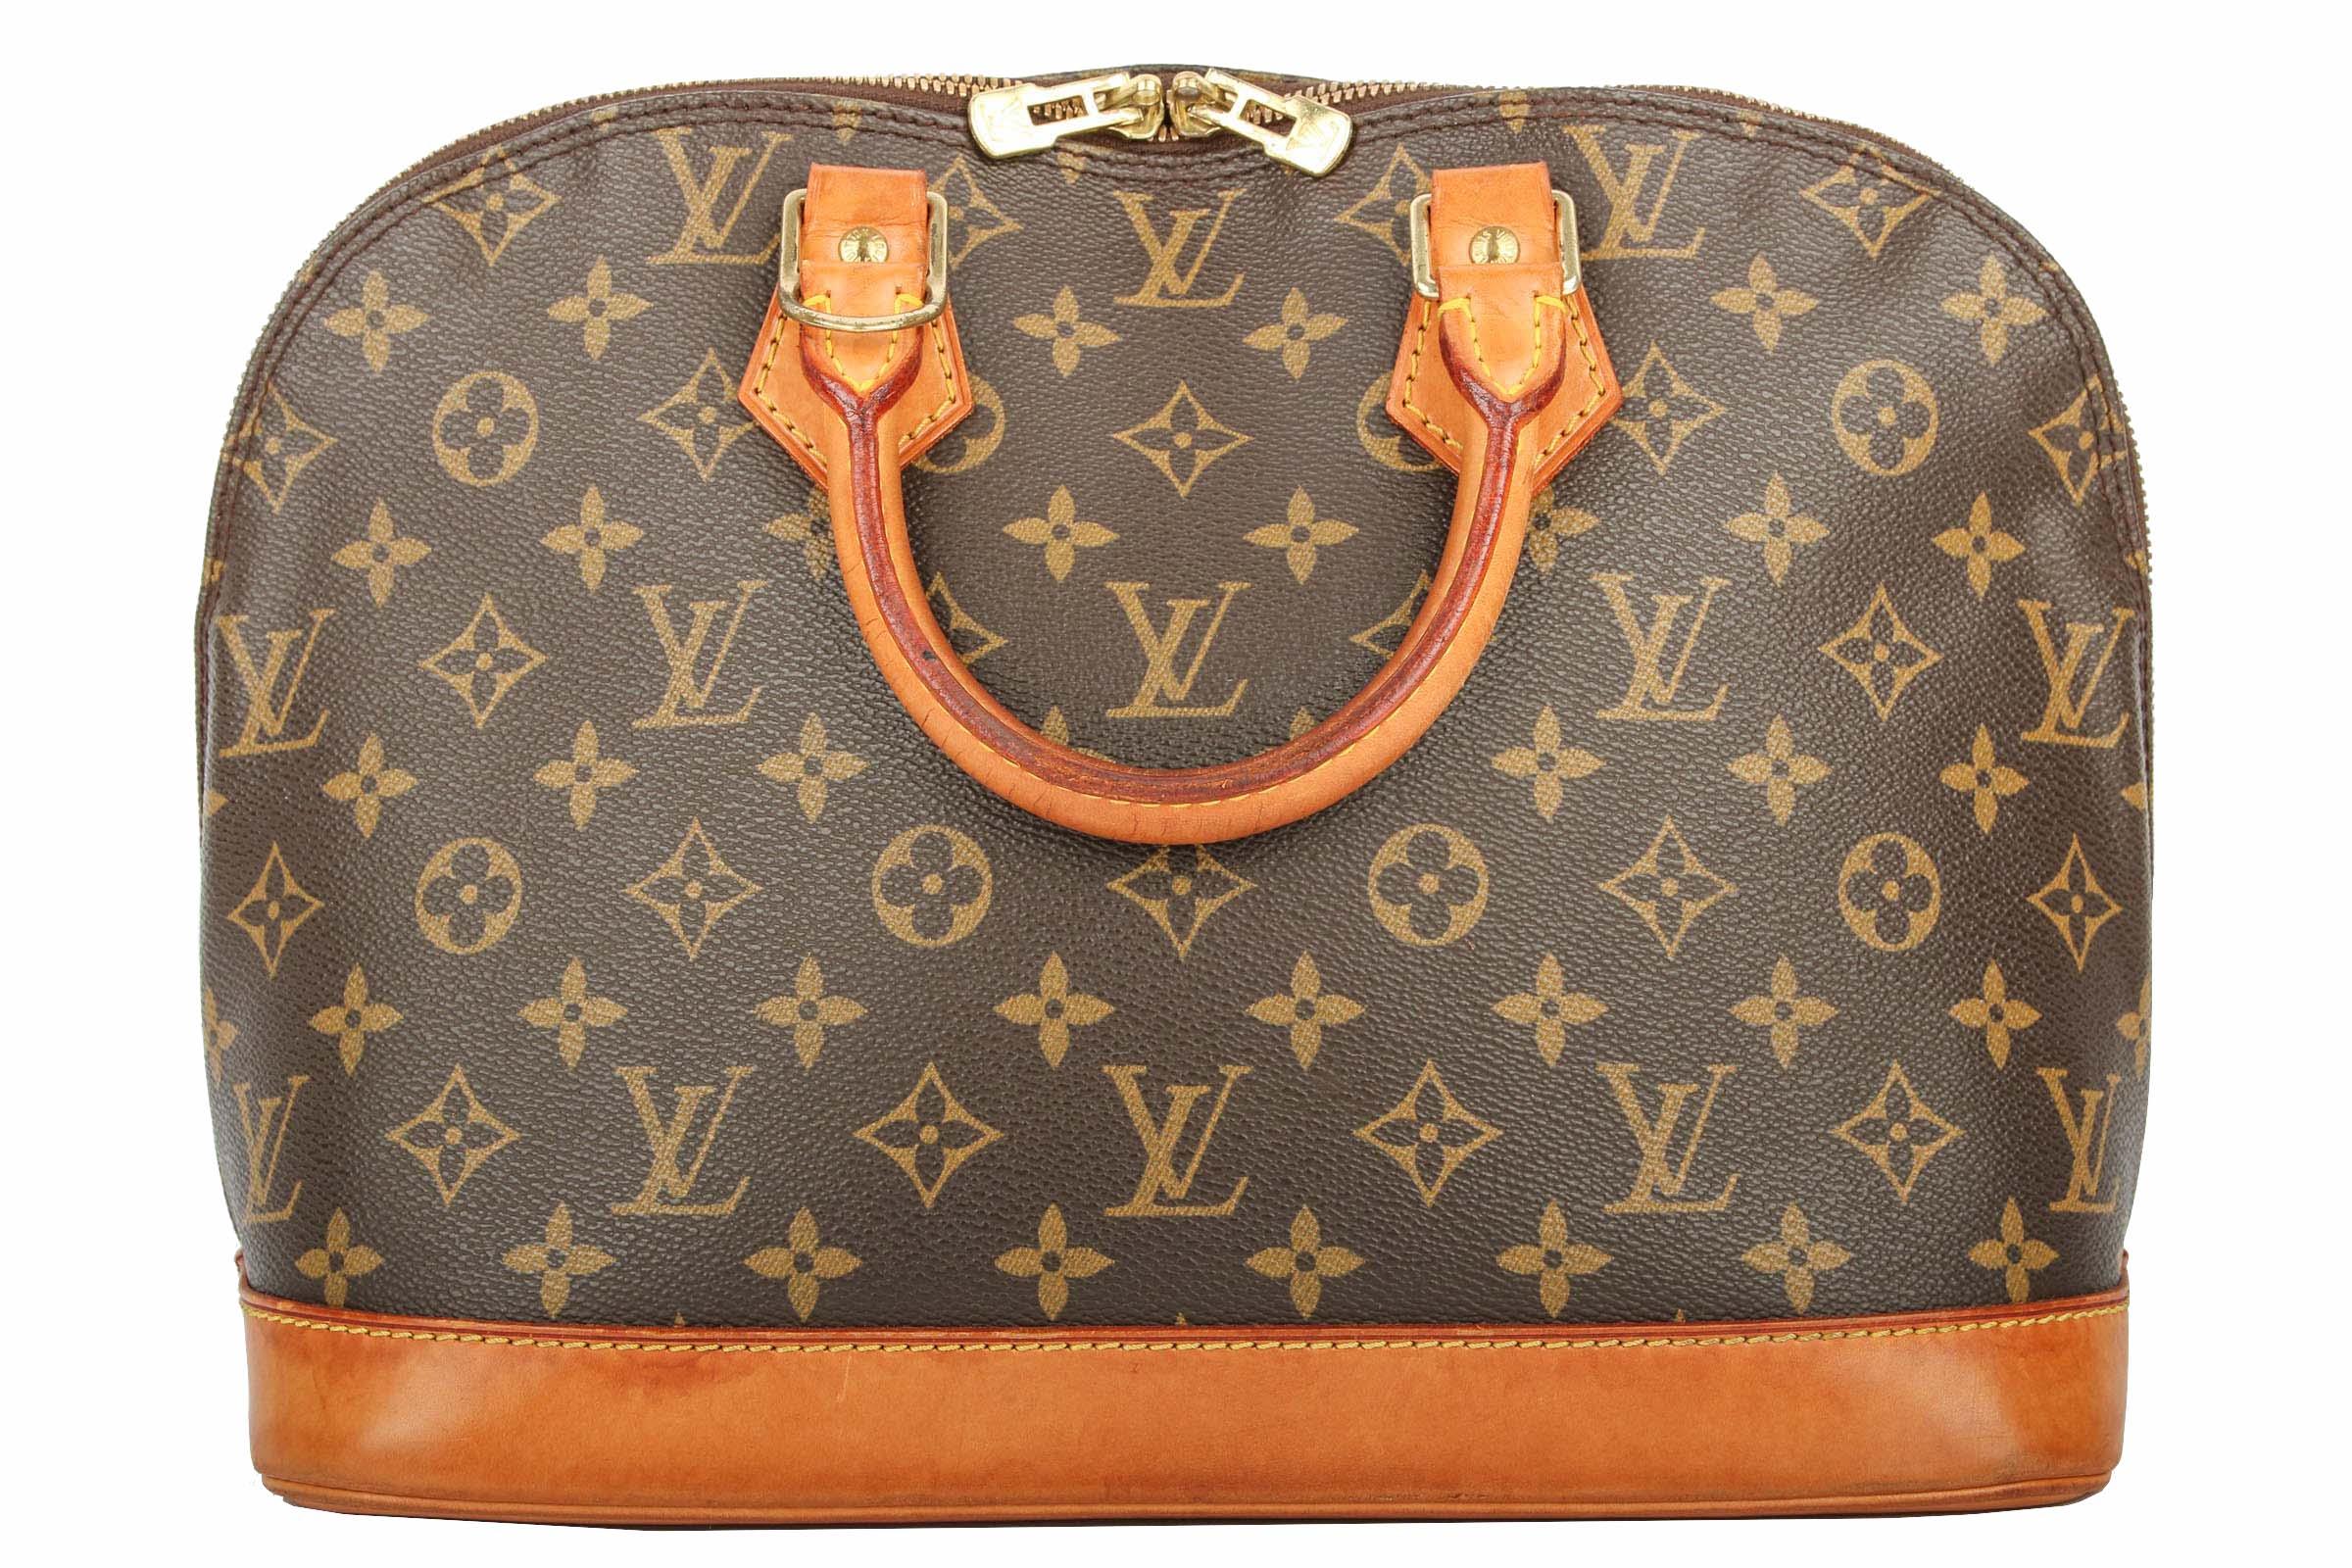 4a94e388b6f0c Louis Vuitton Handtaschen   Accessoires